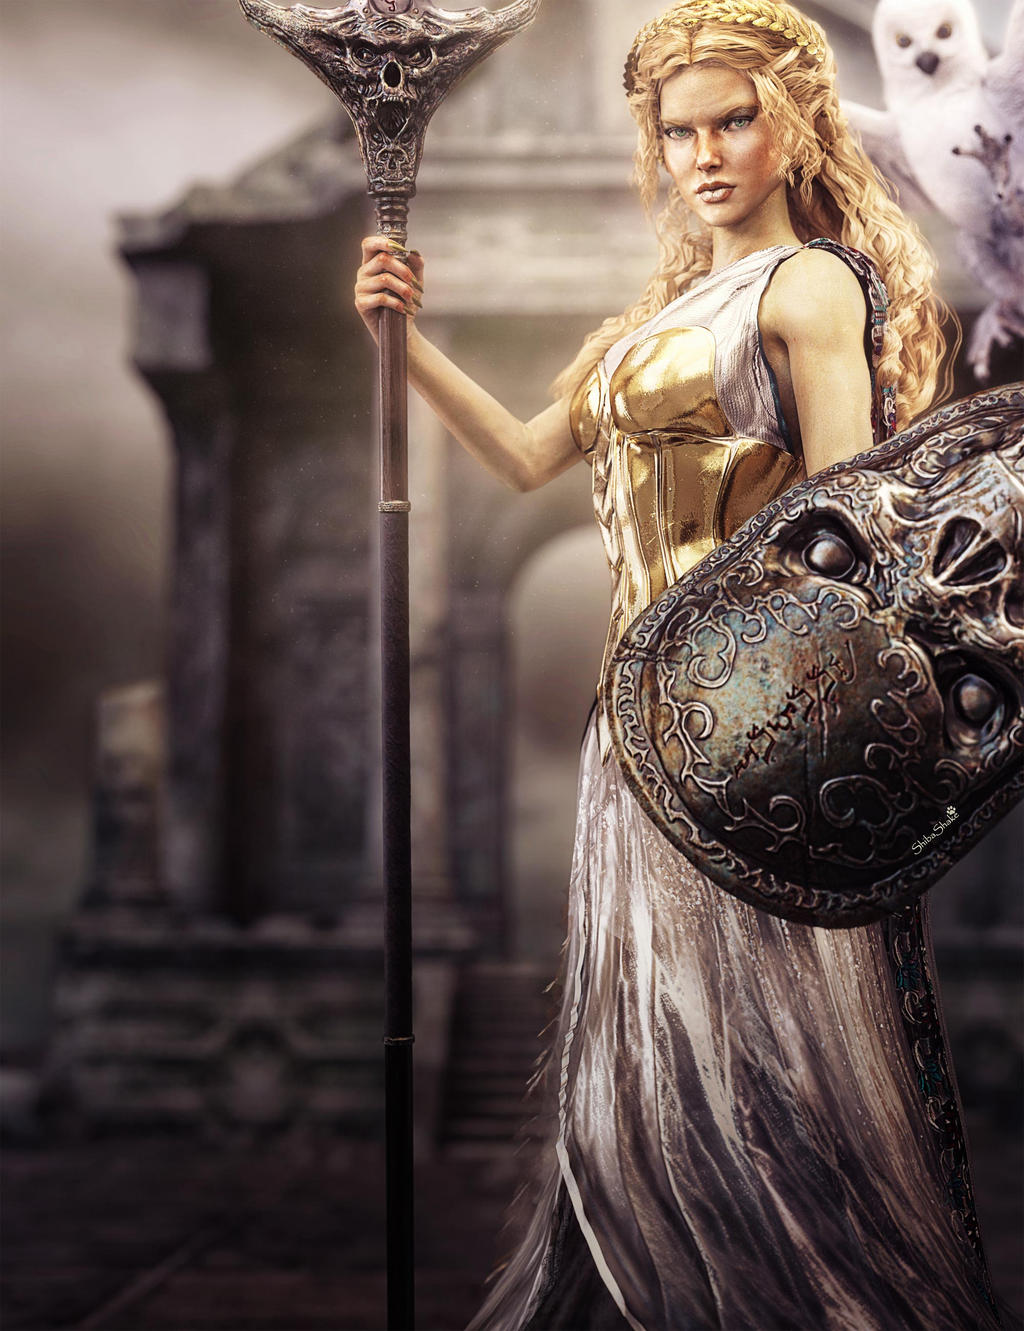 Athena, Goddess of War and Wisdom, Fantasy Art by shibashake